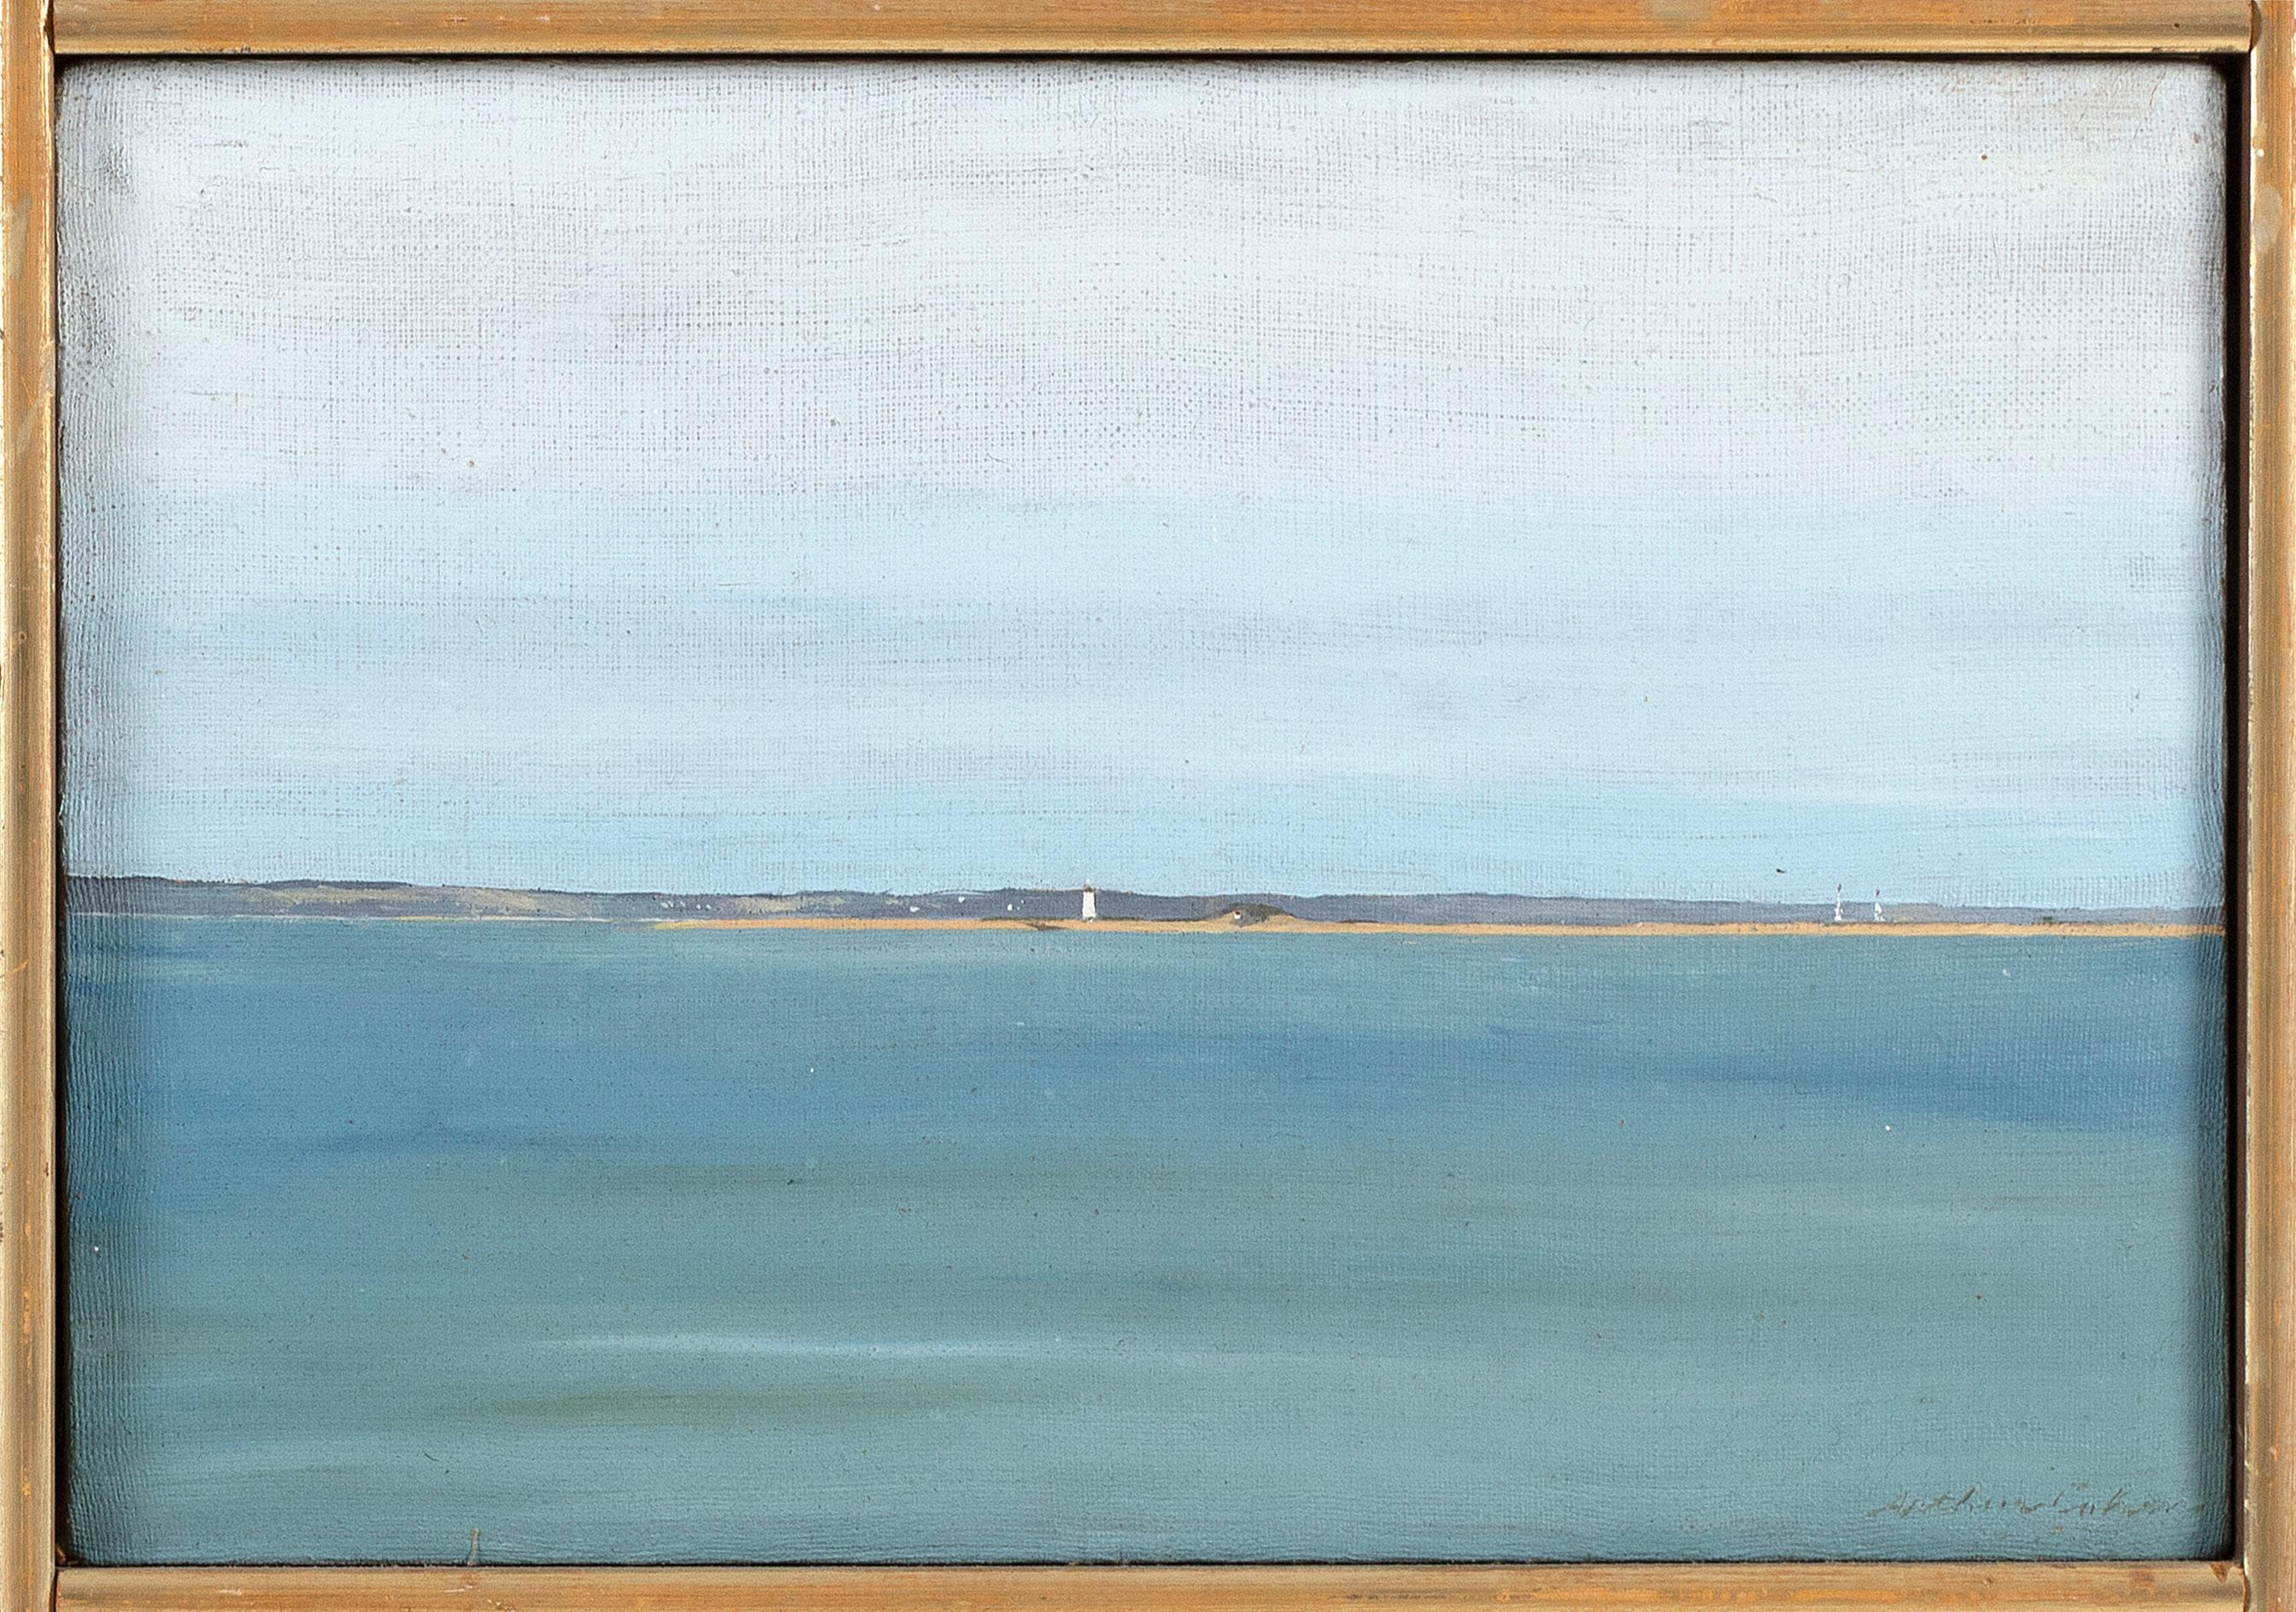 "ARTHUR MORRIS COHEN (New York, 1928-2012), ""Long Point""., Oil on canvas, 8"" x 12"". Framed 8.5"" x 12.5""."